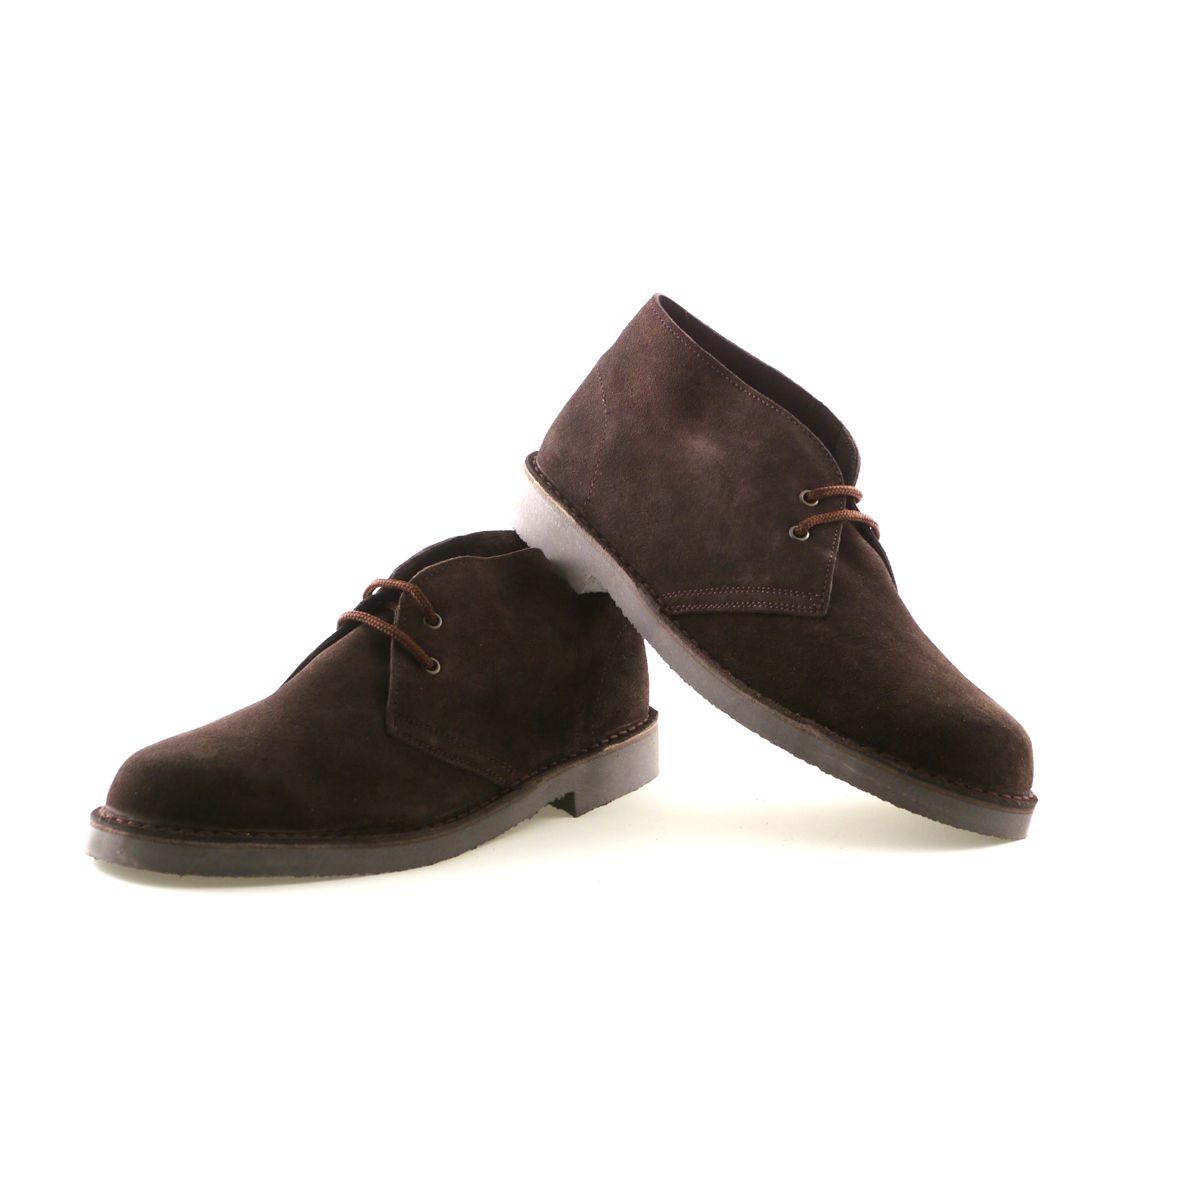 chaussures de s curit grande taille montantes roamers. Black Bedroom Furniture Sets. Home Design Ideas